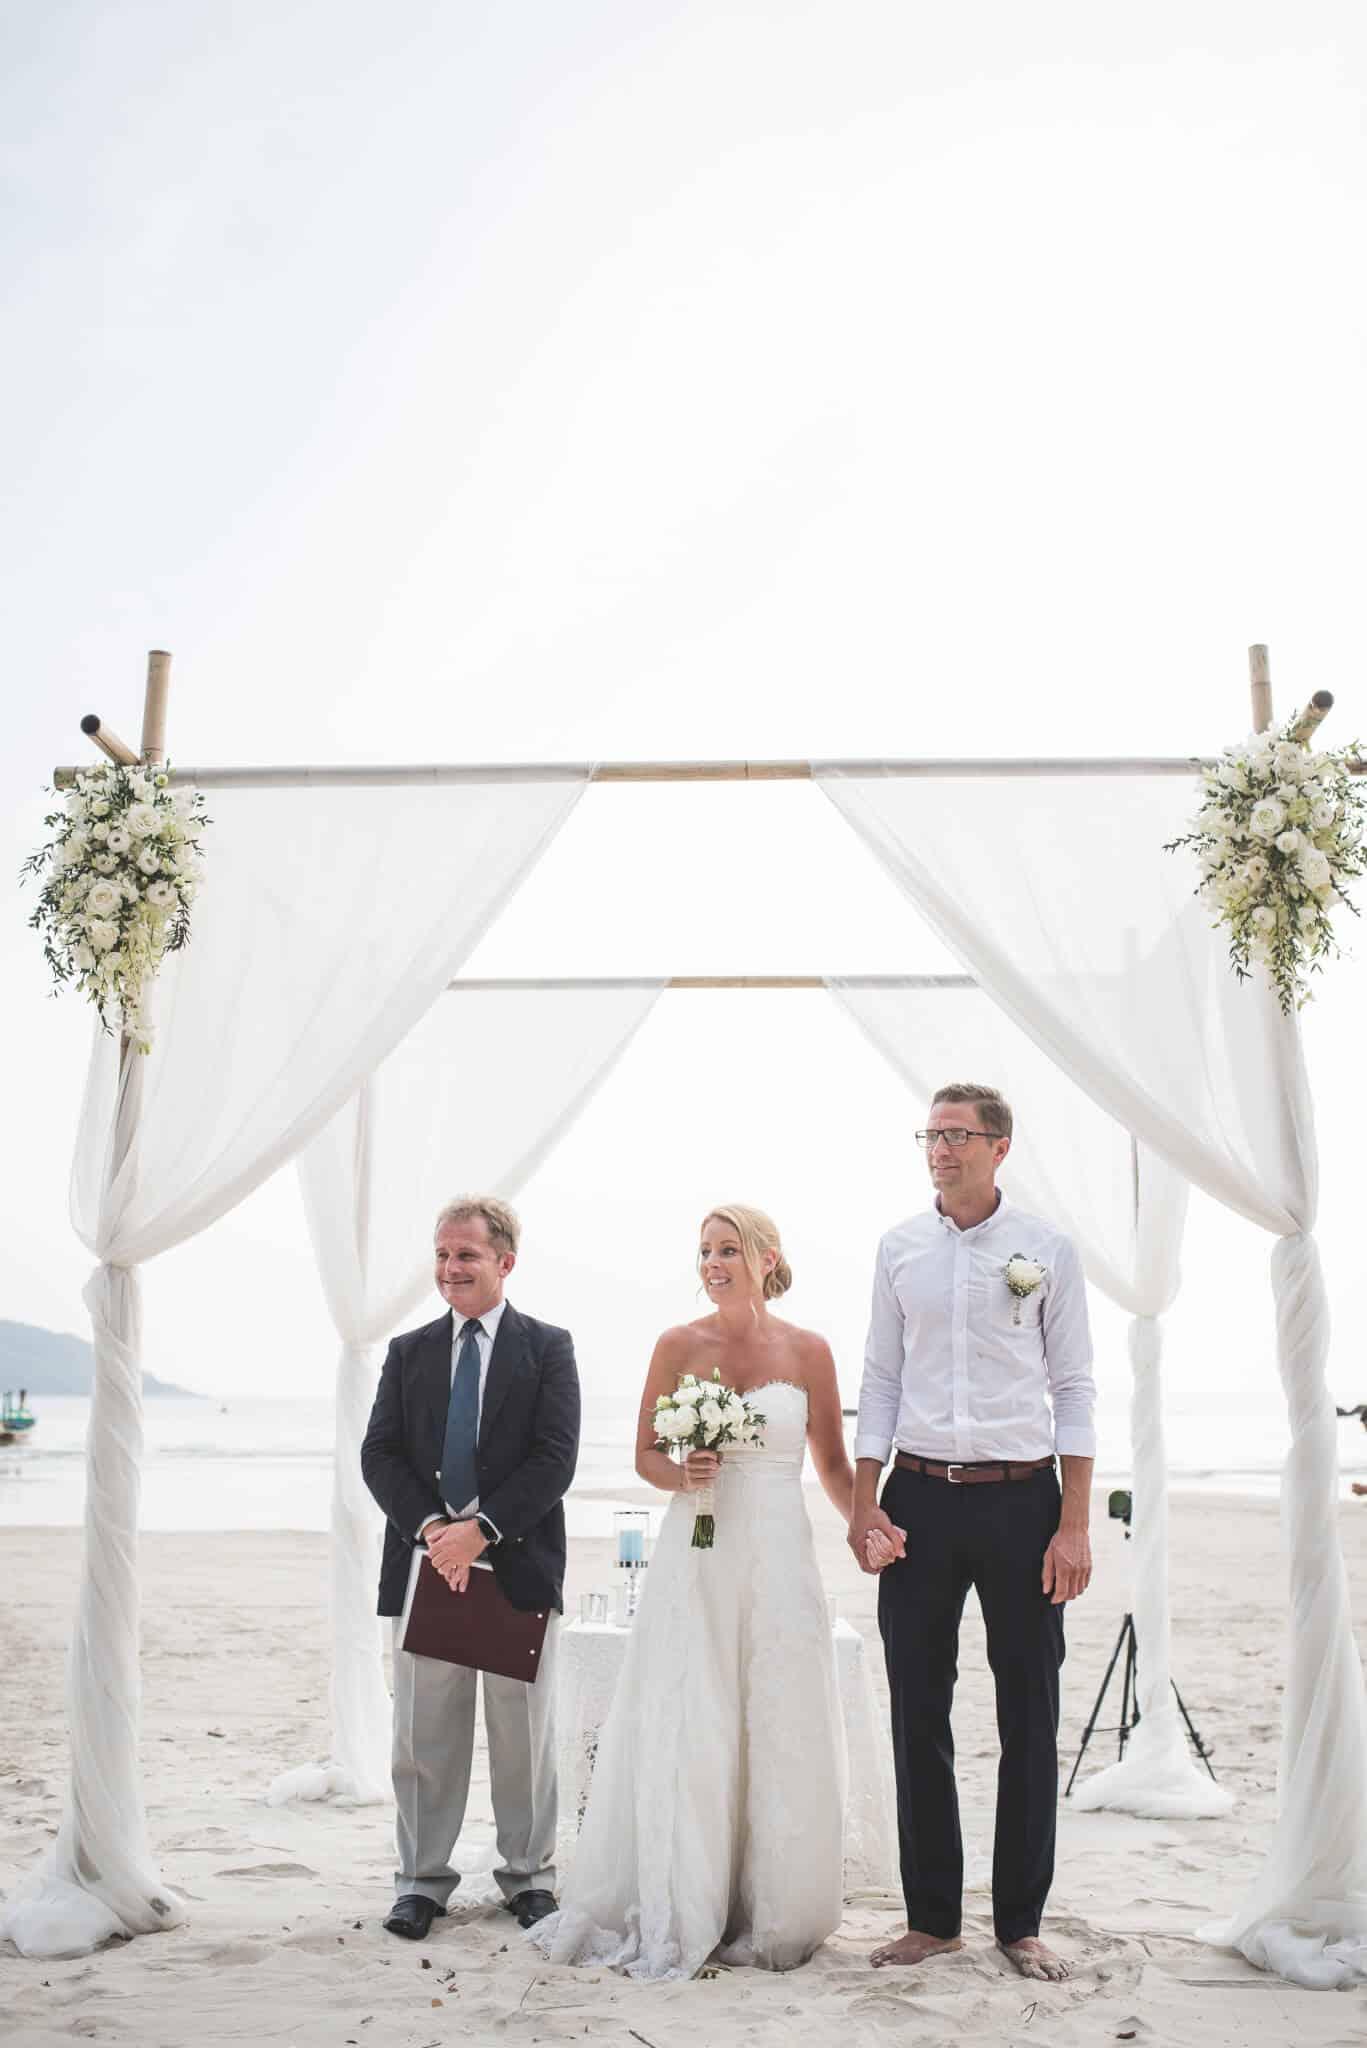 Wedding Celebrant Phuket 10 1